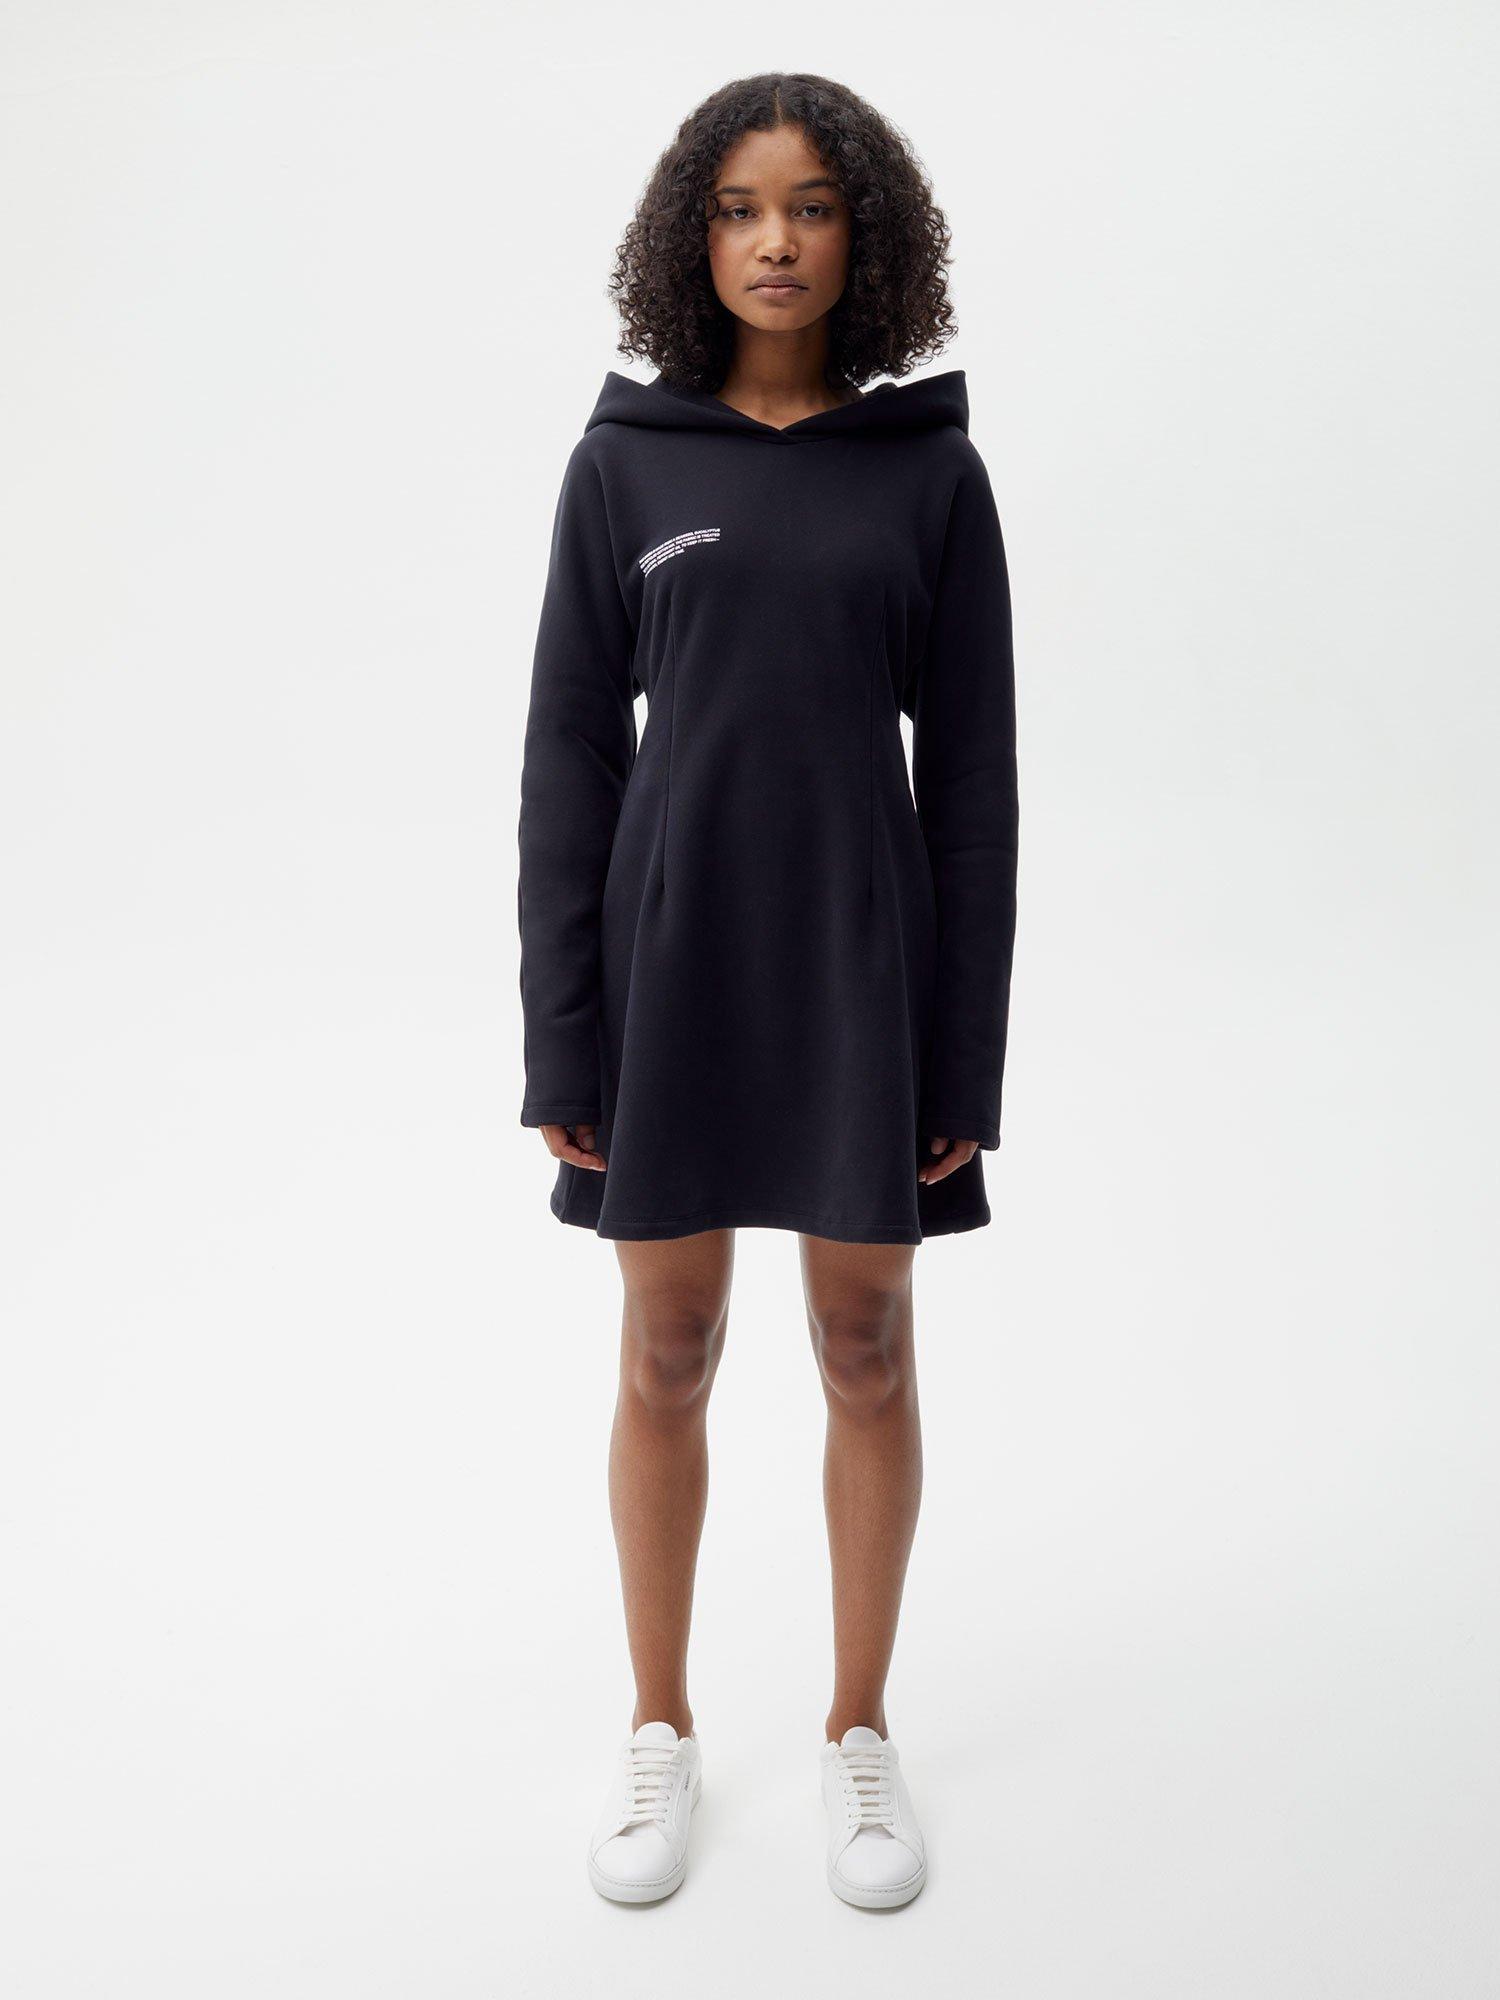 C-FIBER™ FUSION hooded dress